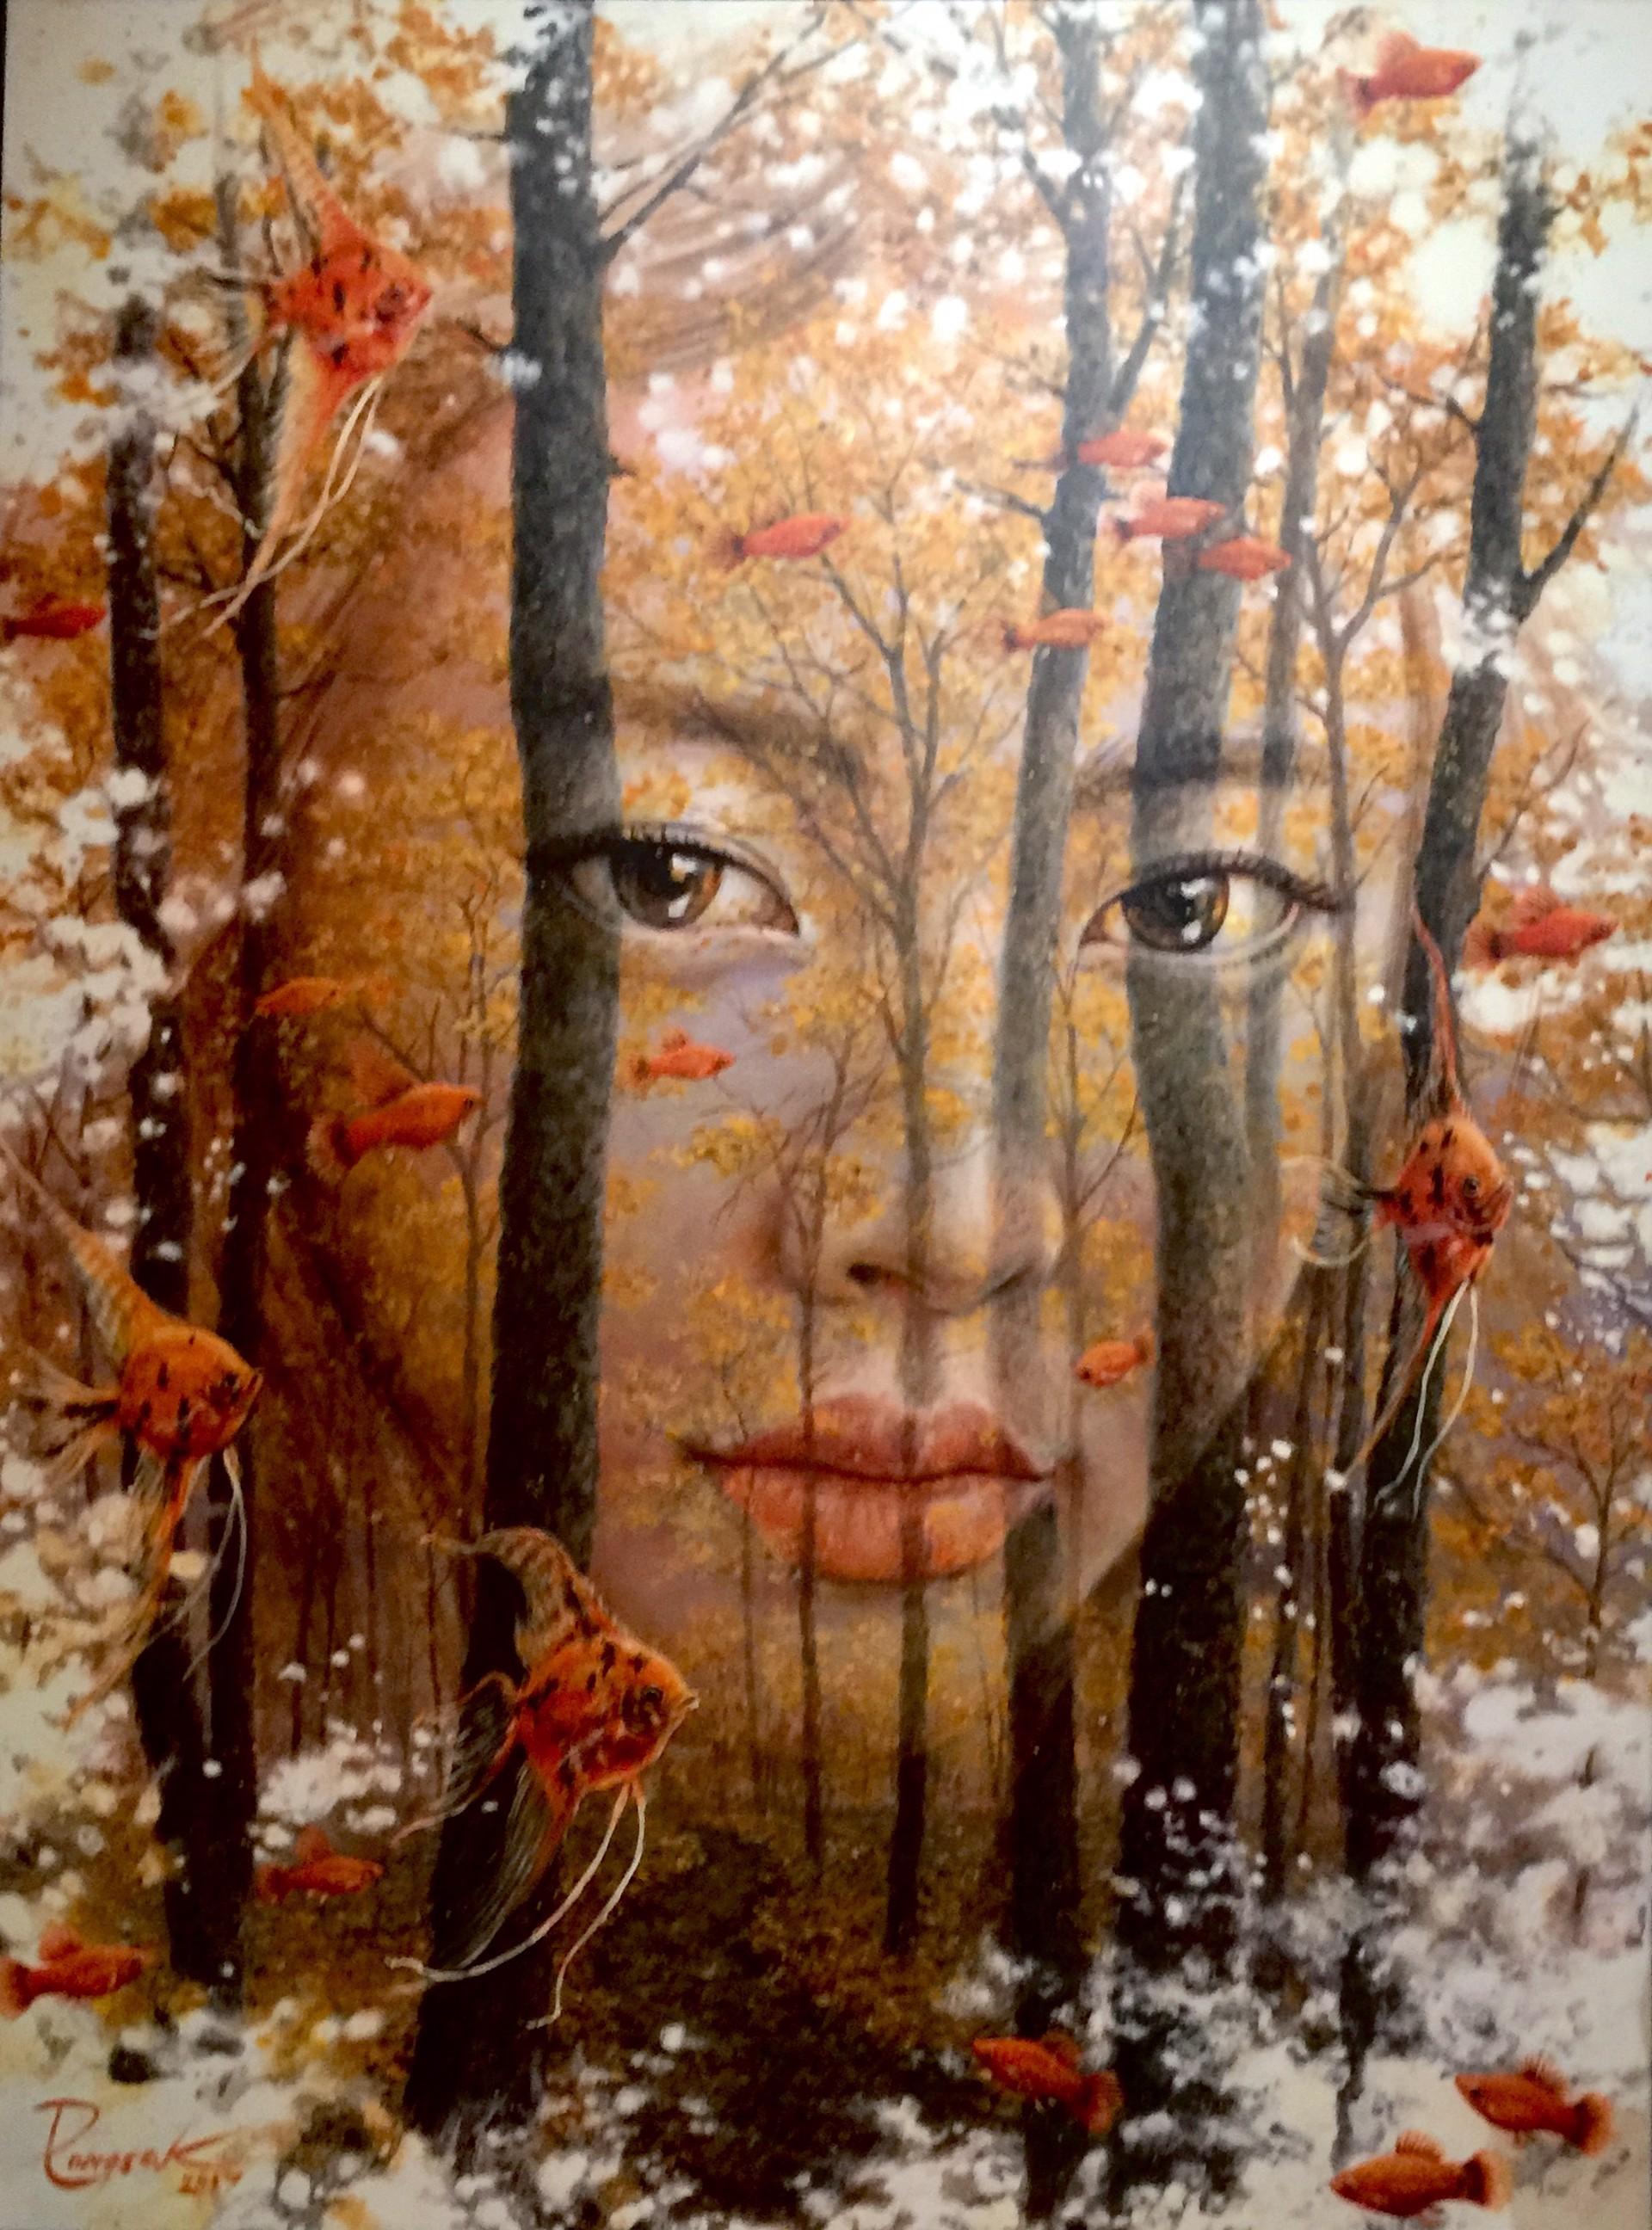 """Face in The Forest"" by Pongsak Kamjornrasamekit"